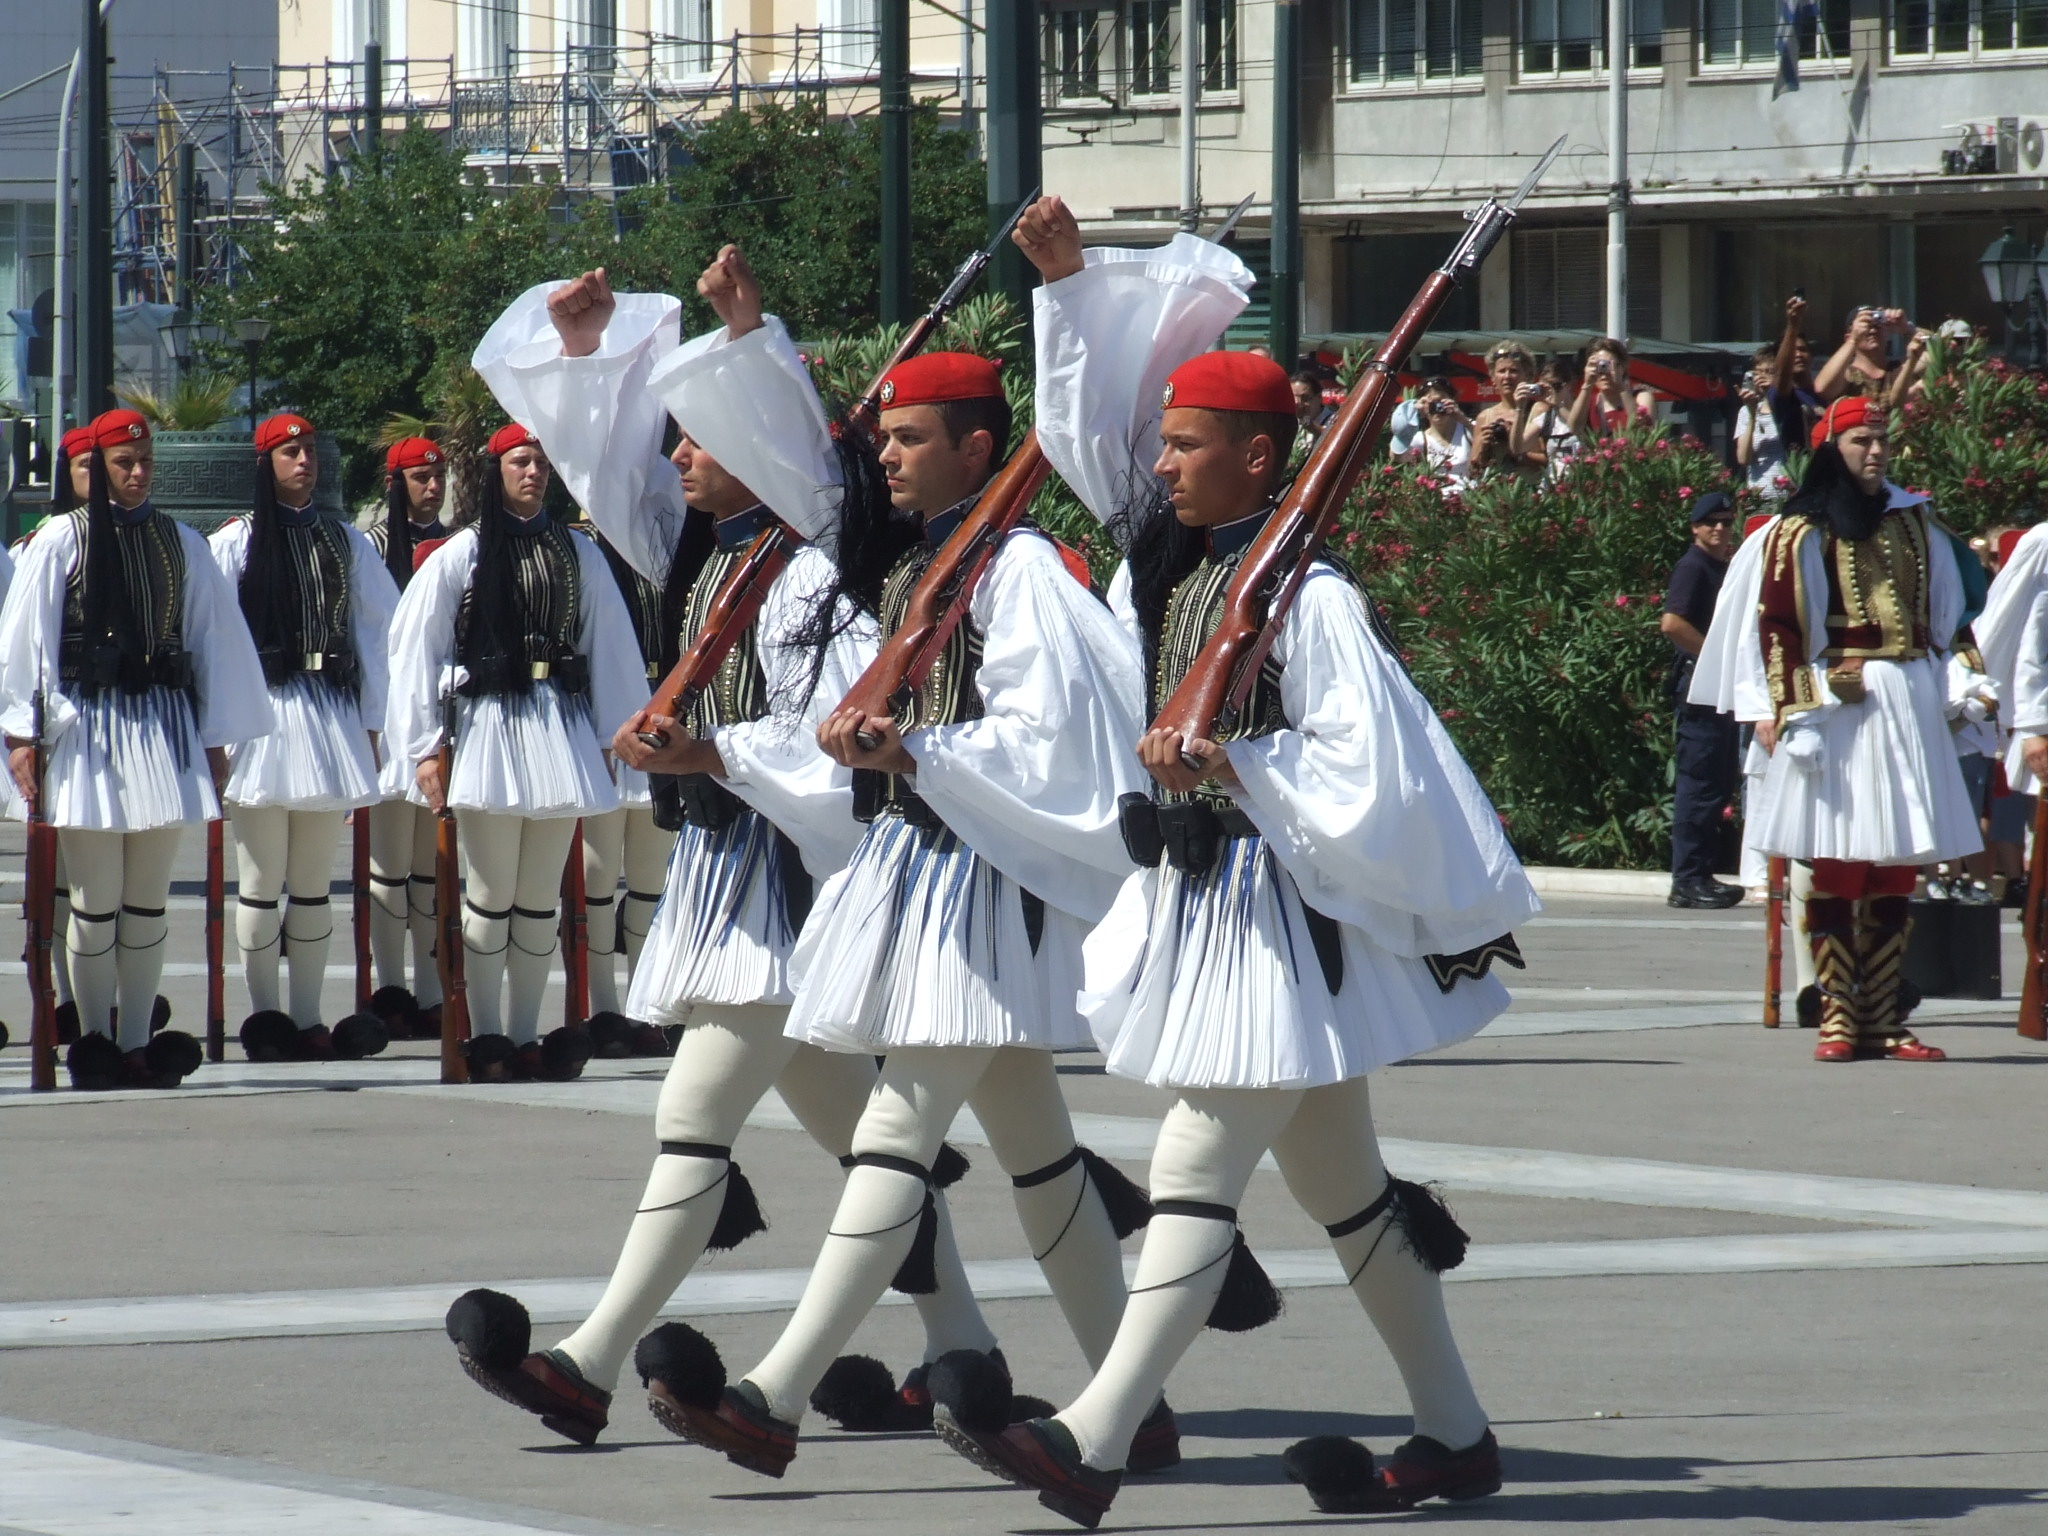 Bilderesultat for military uniforms around the world